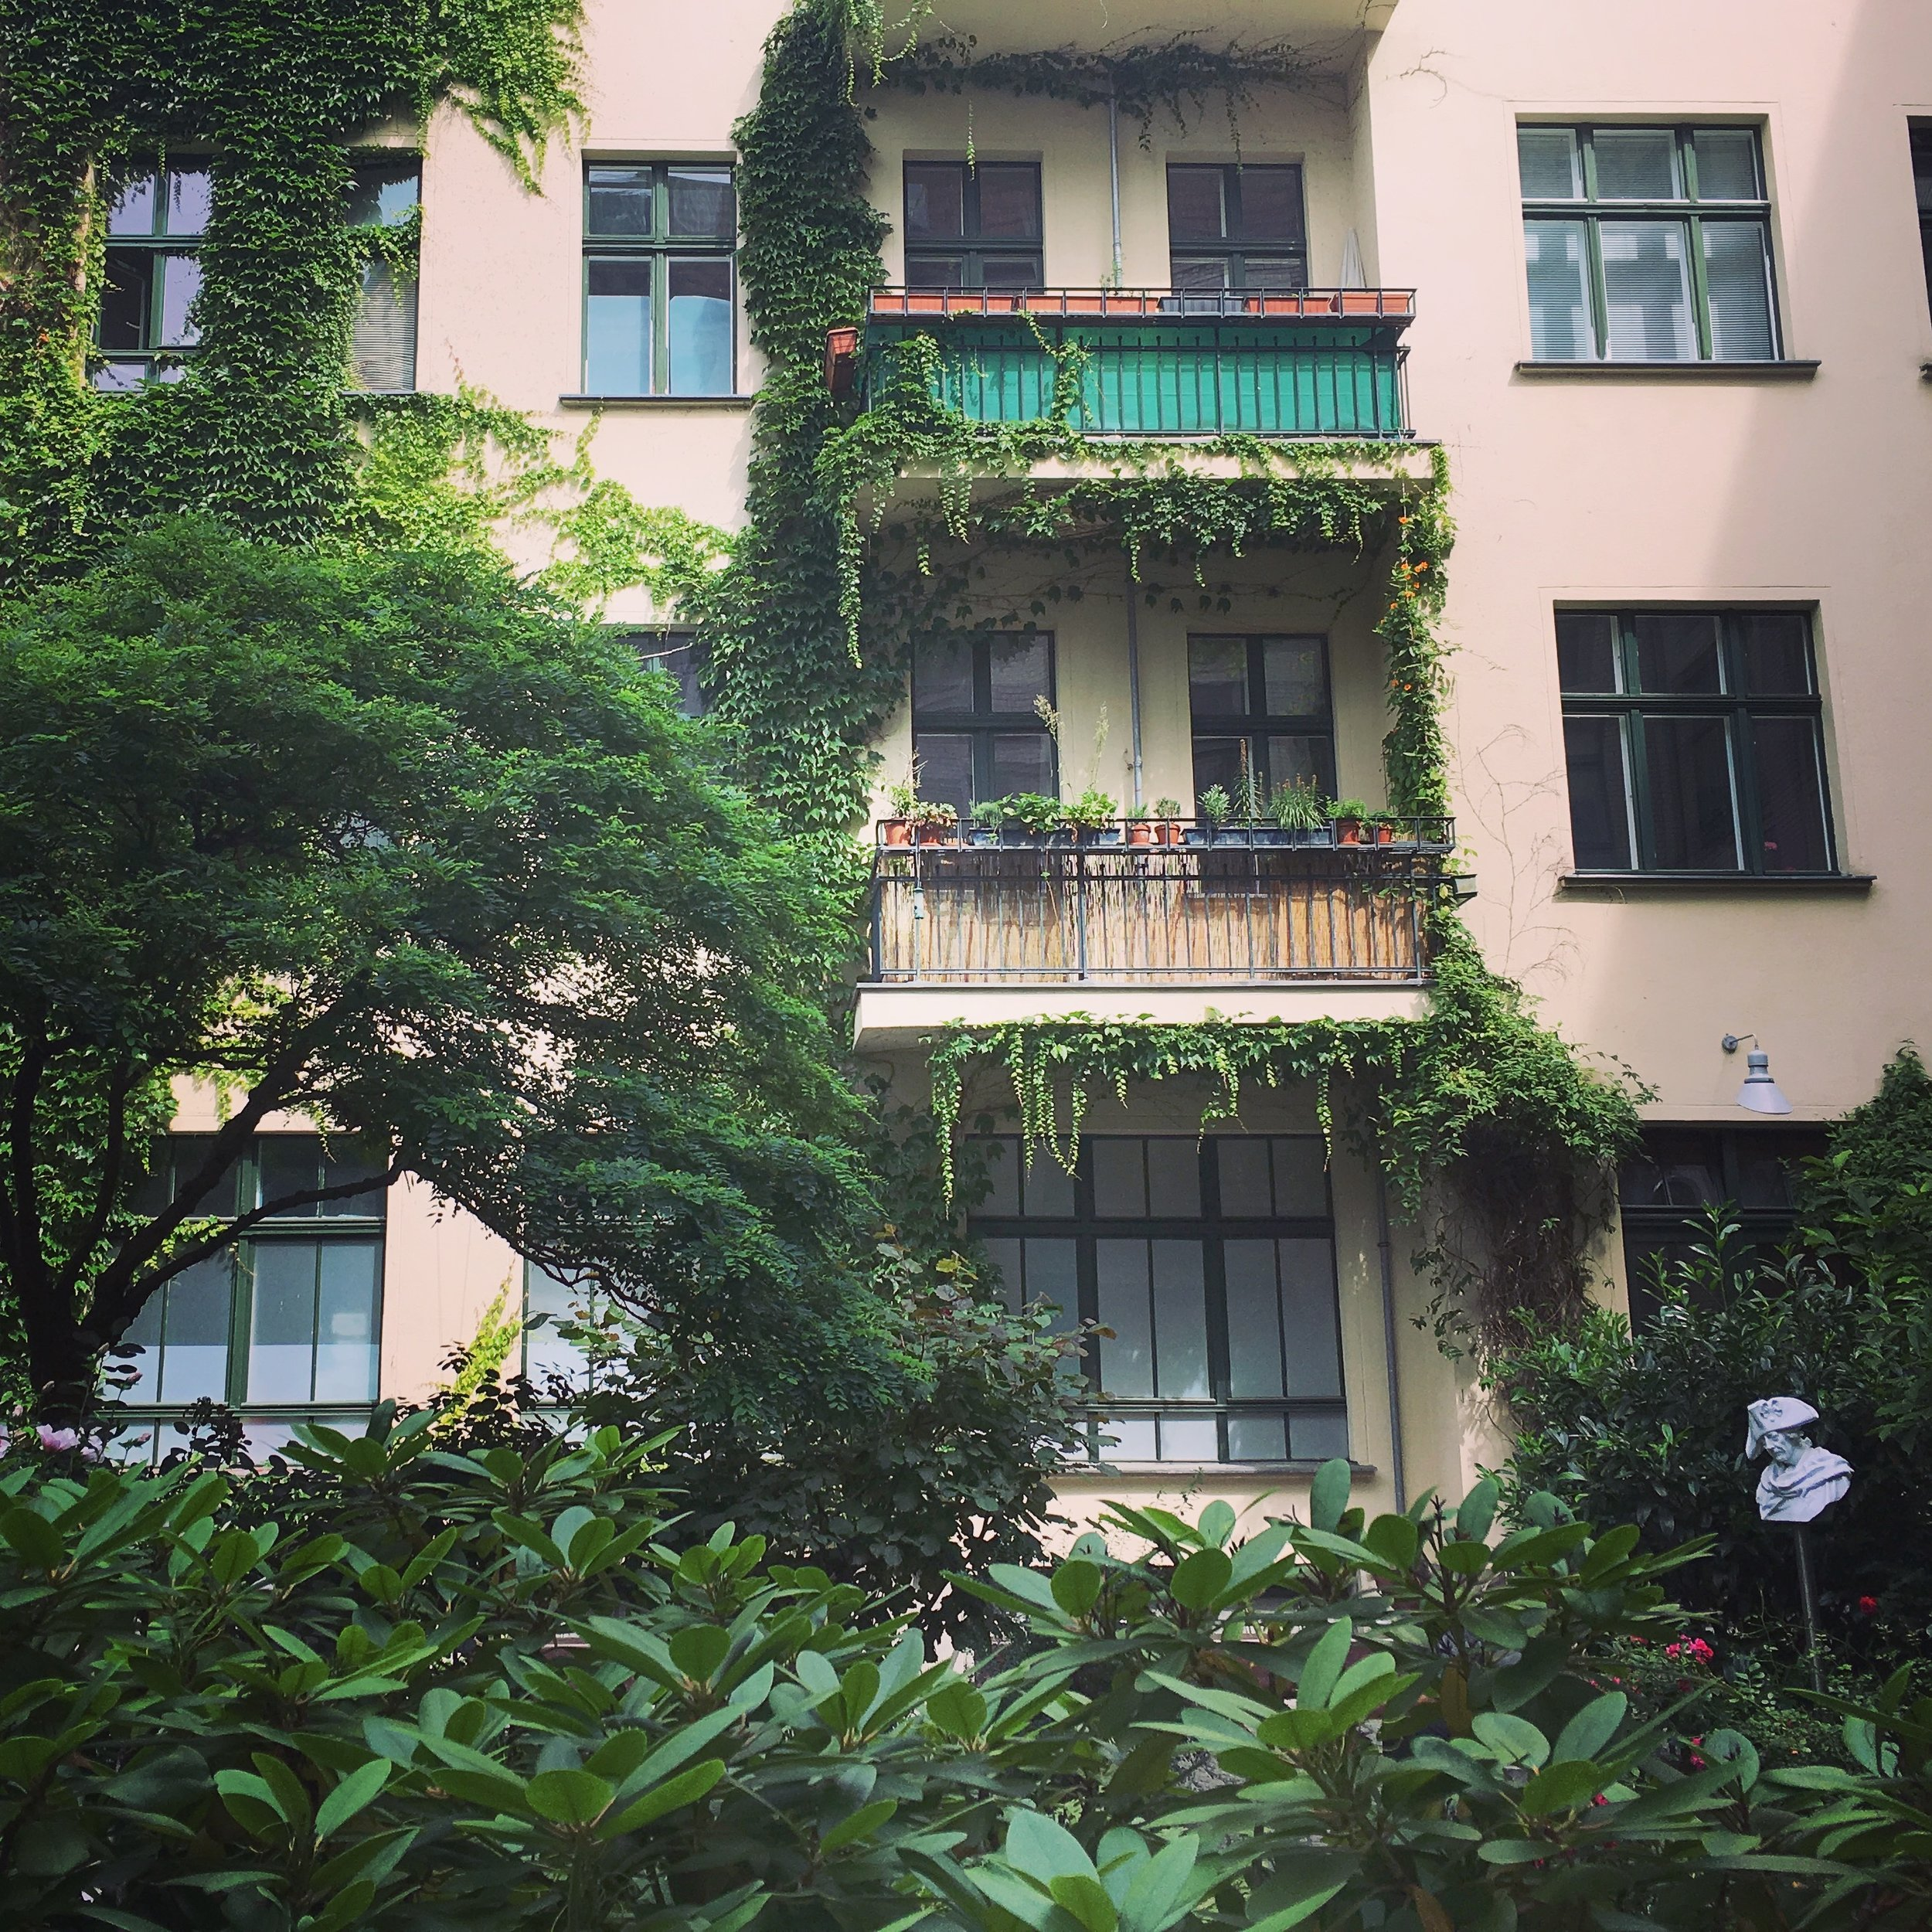 Hackesche-Hoefe-Wohnungen-Berlin